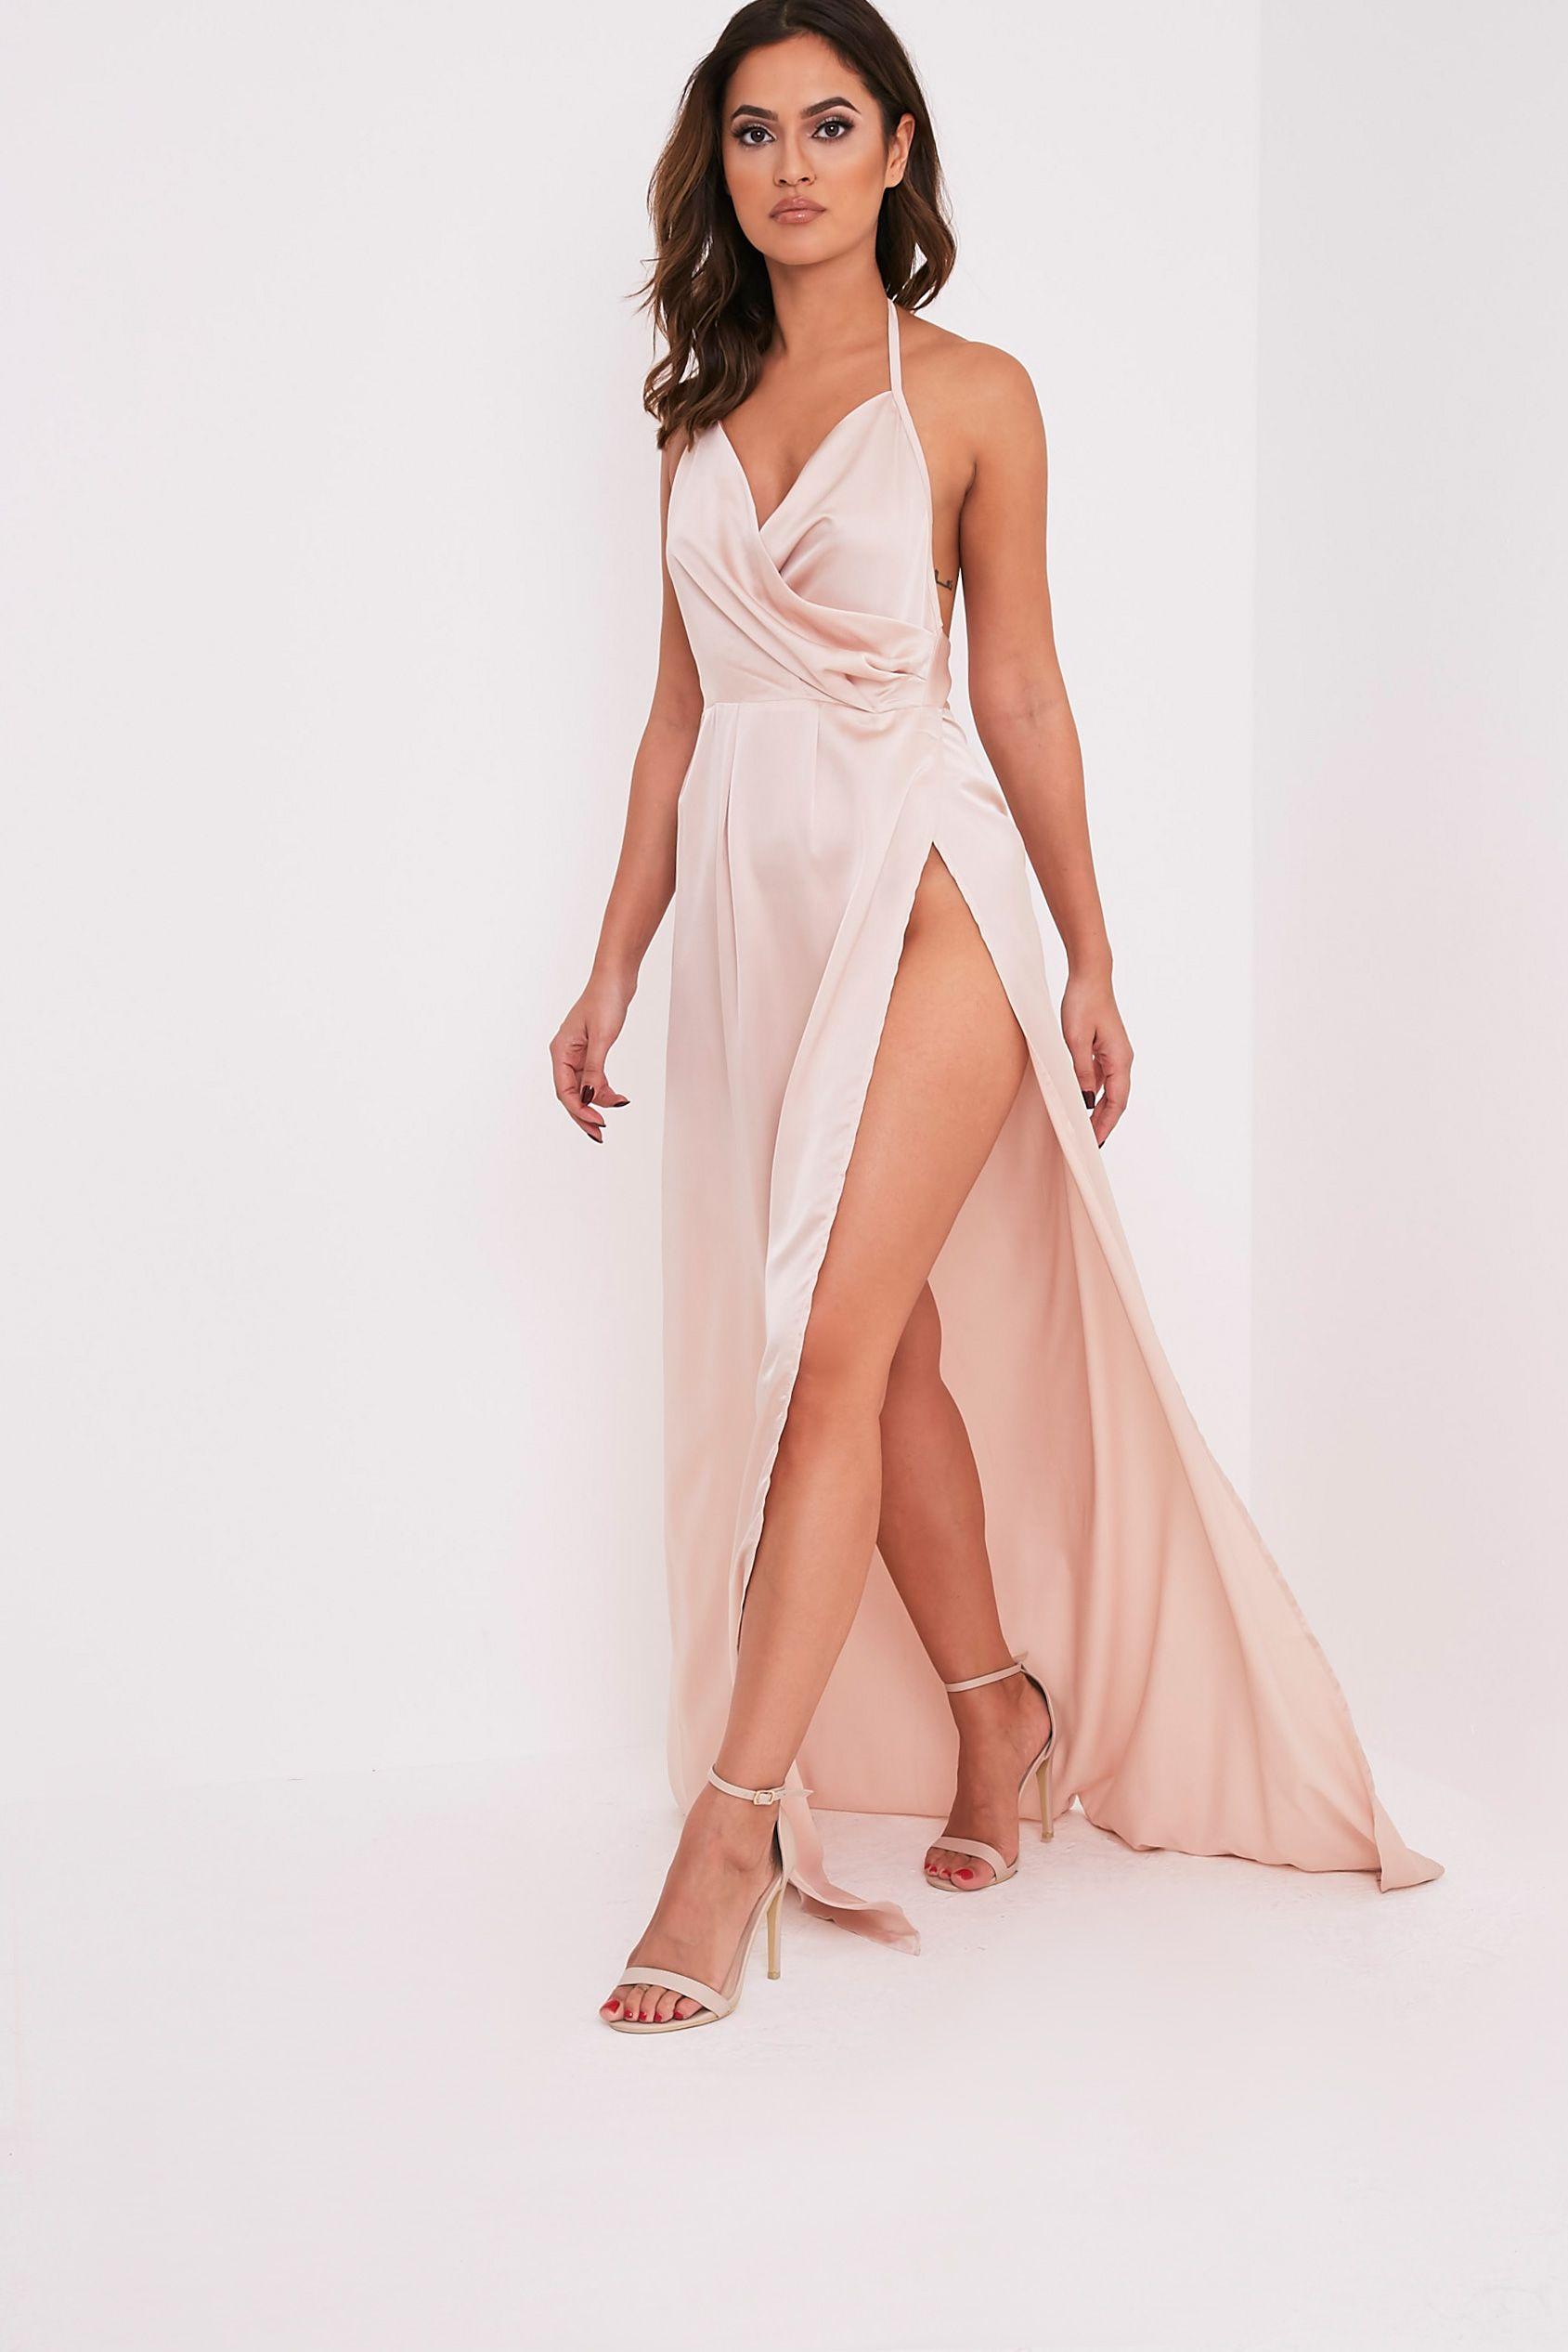 Popular Sale Online Shop Cheap Price White Floral Print Extreme Plunge Split Detail Maxi Dress Pretty Little Thing Pcf6eR